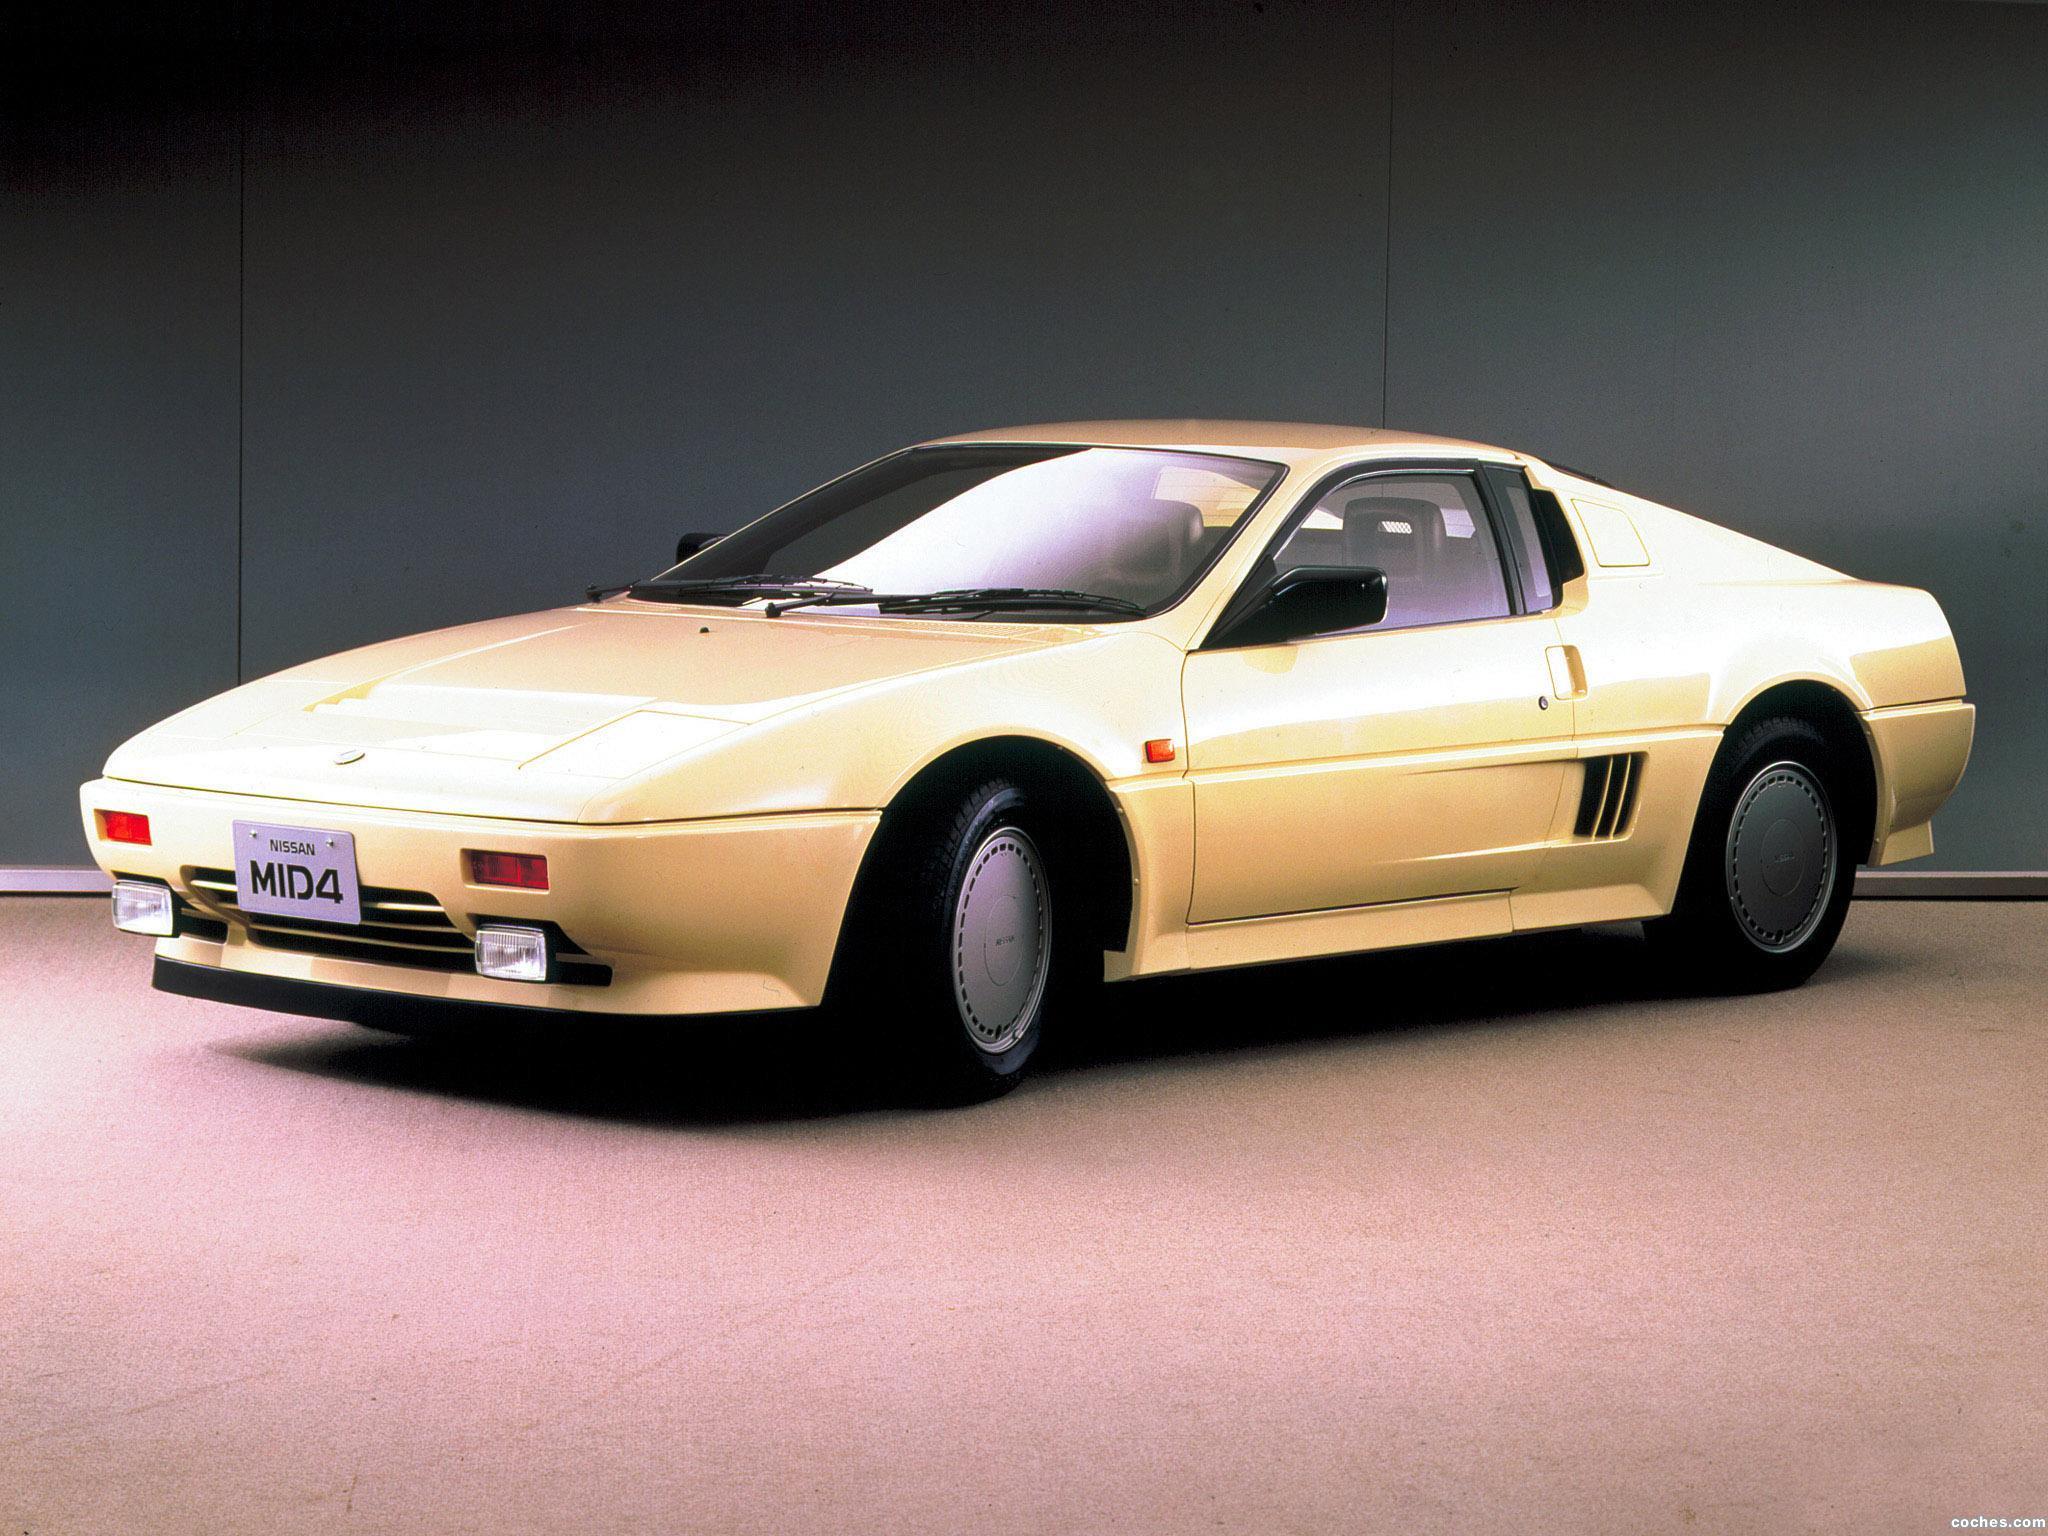 Foto 0 de Nissan Mid4 Type I Concept 1985